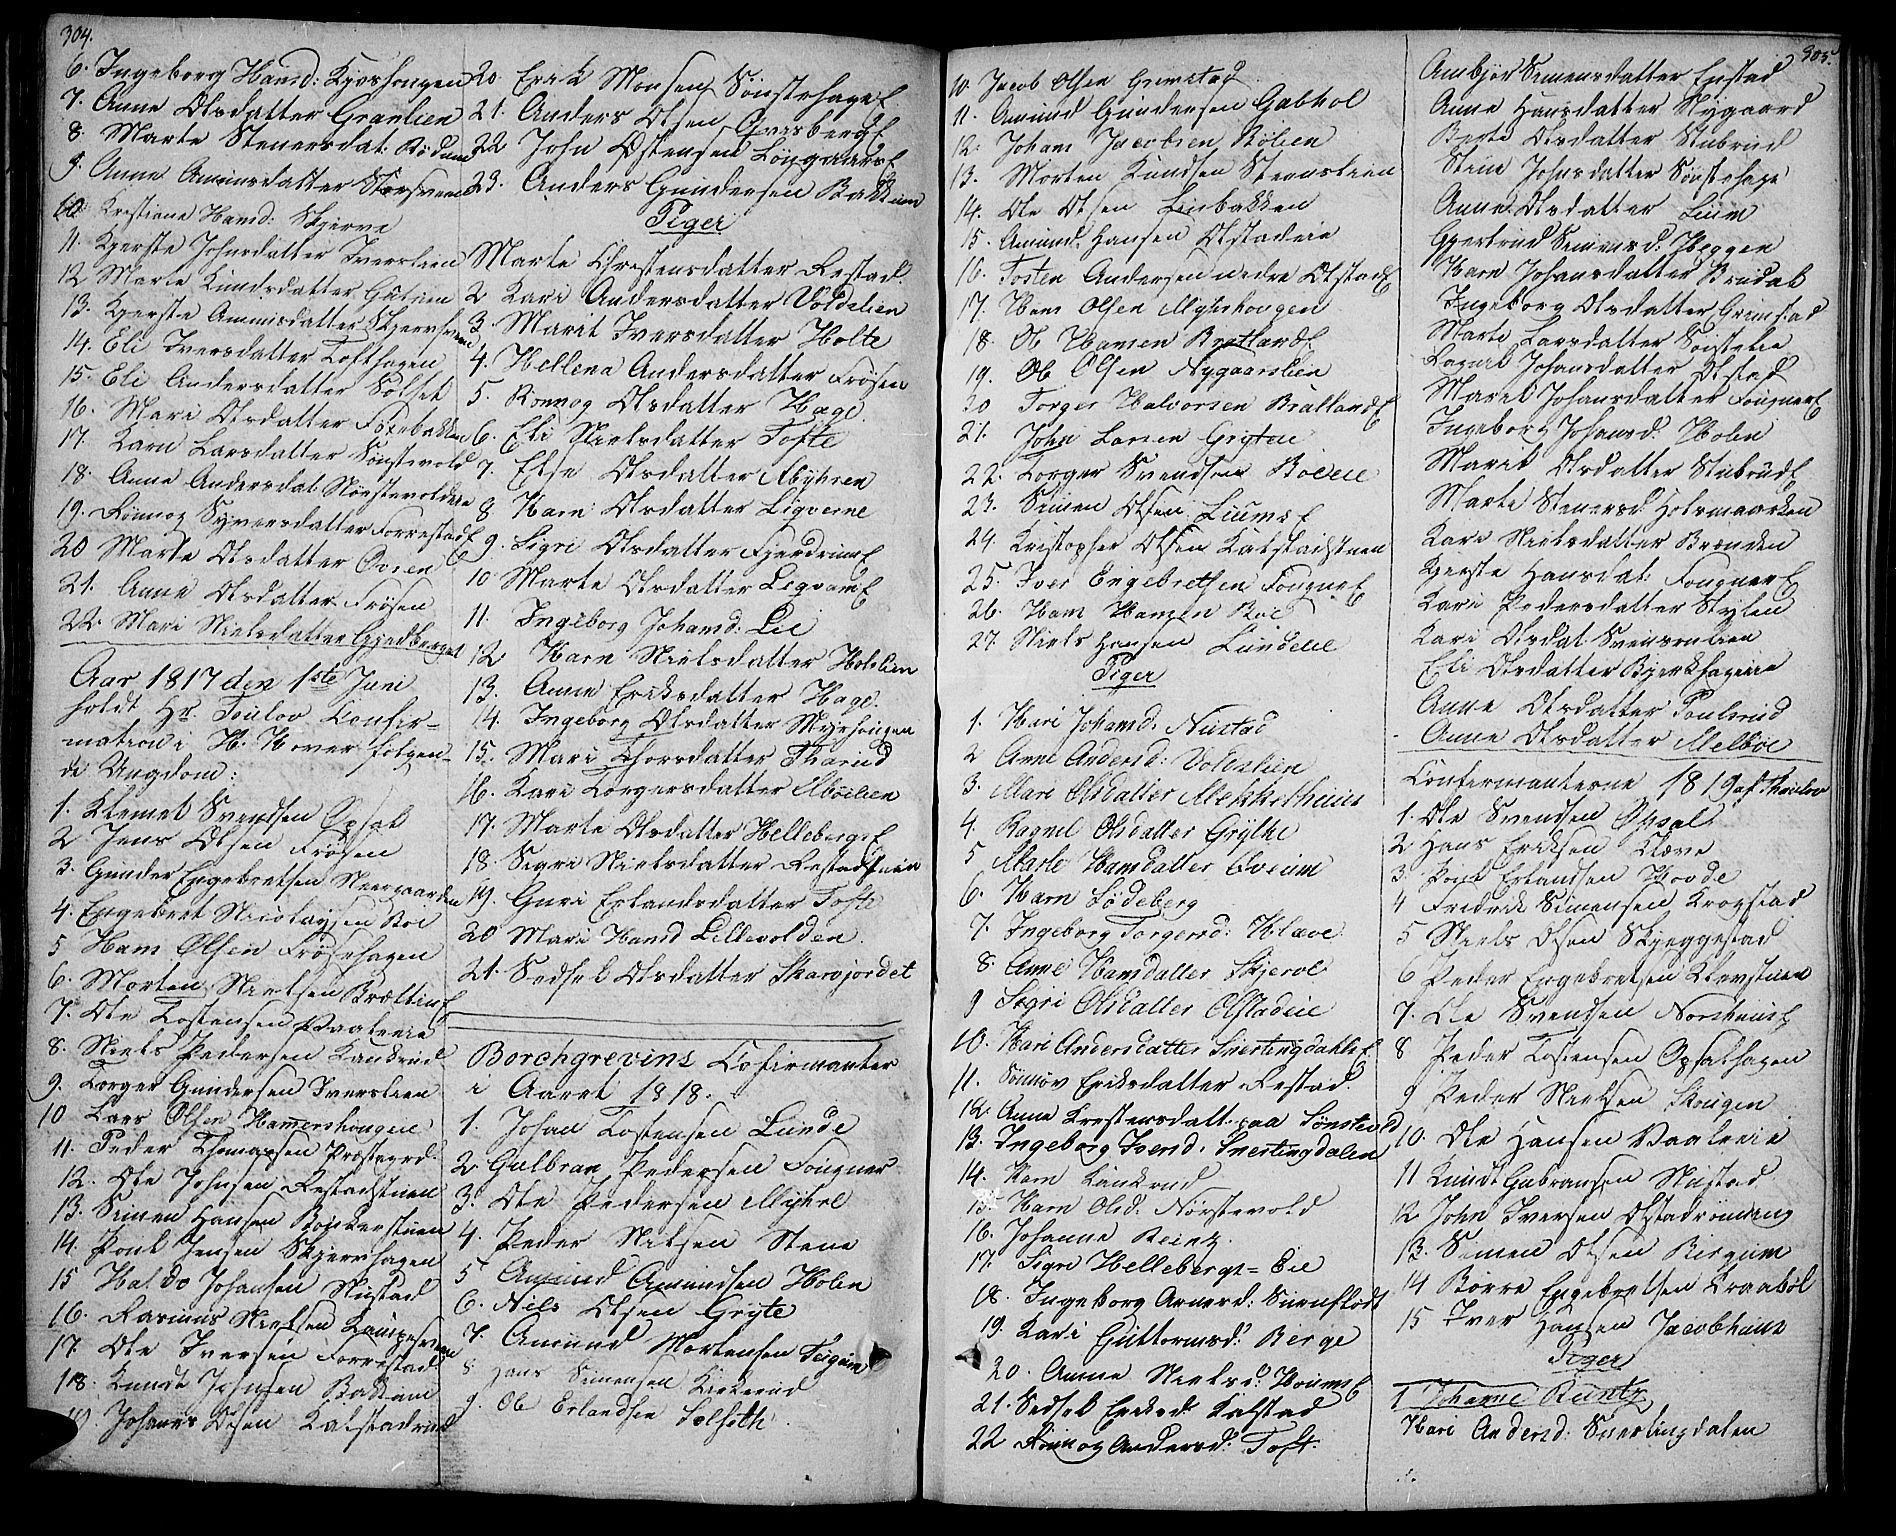 SAH, Gausdal prestekontor, Ministerialbok nr. 4, 1809-1817, s. 304-305